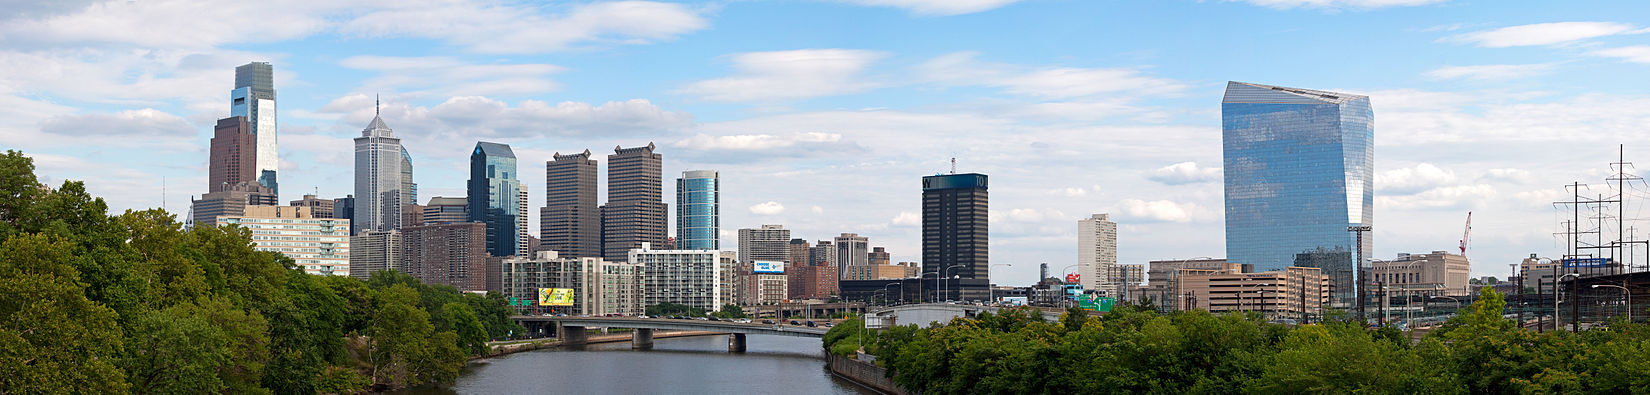 Skyline Philadelphia PA